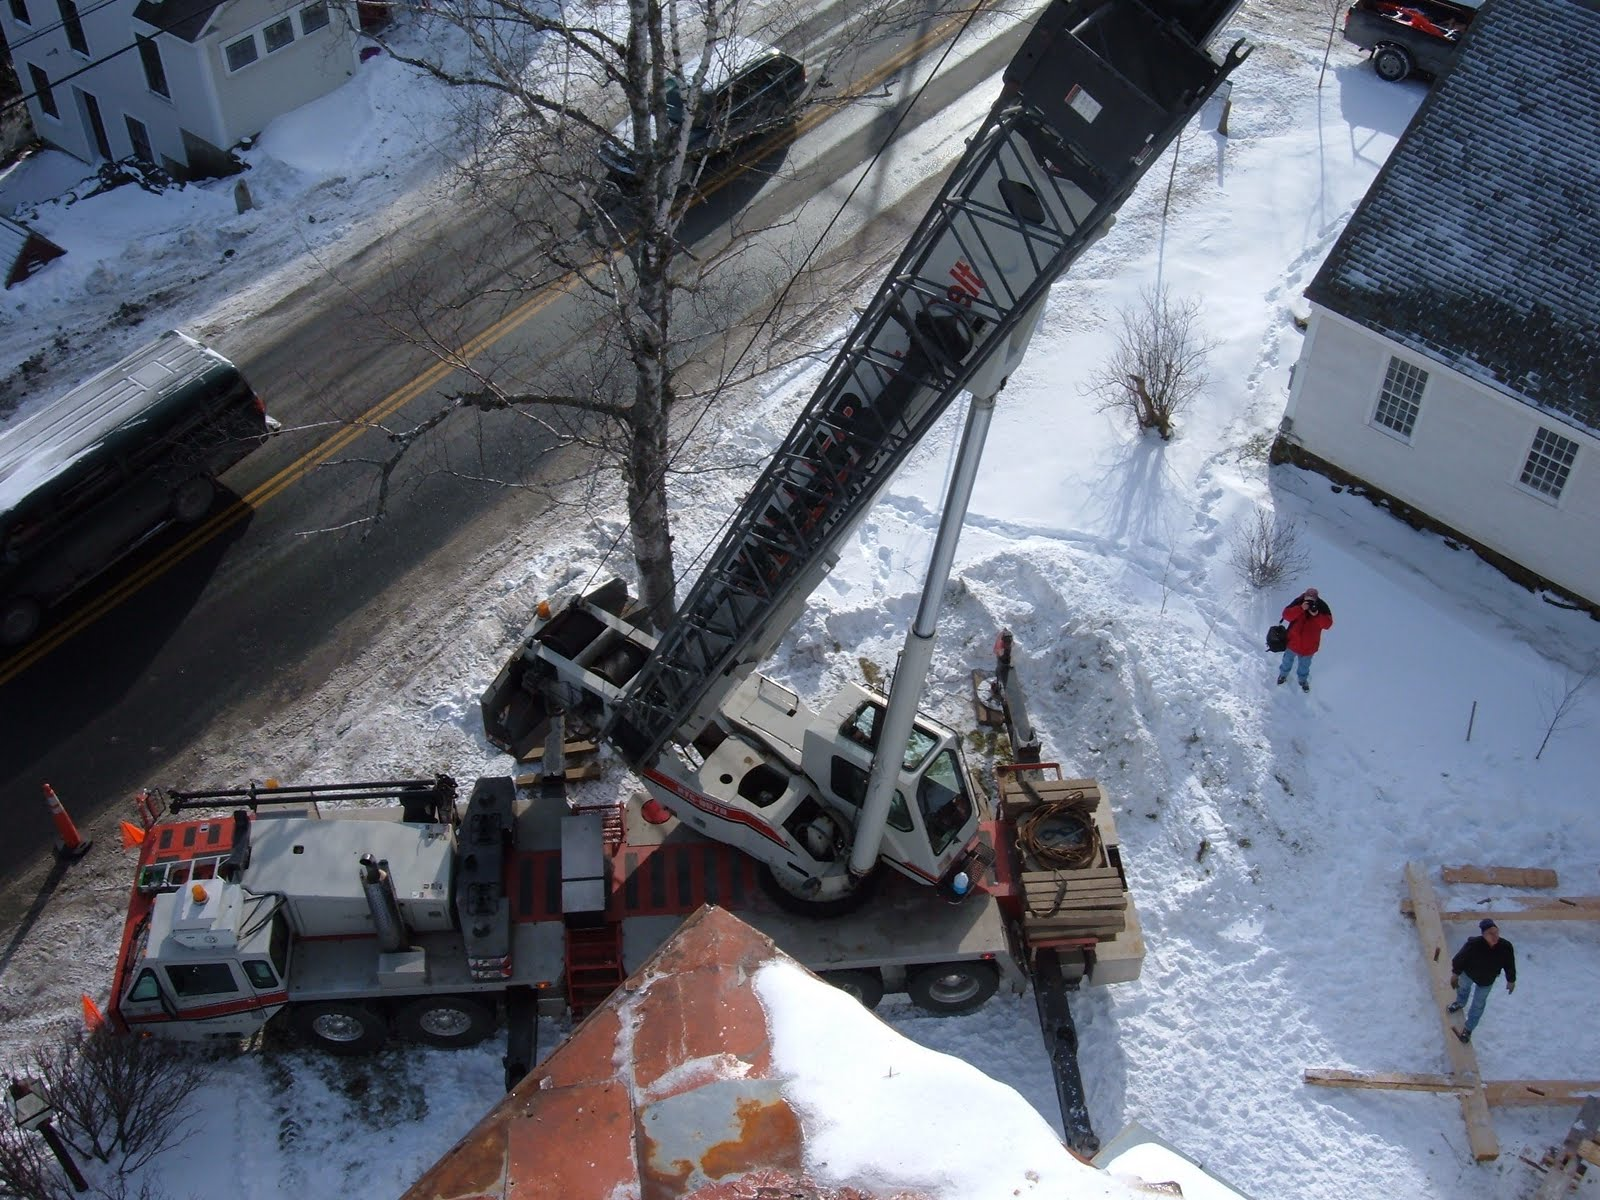 Jan Lewandoski waits below for the roof to be lowered.